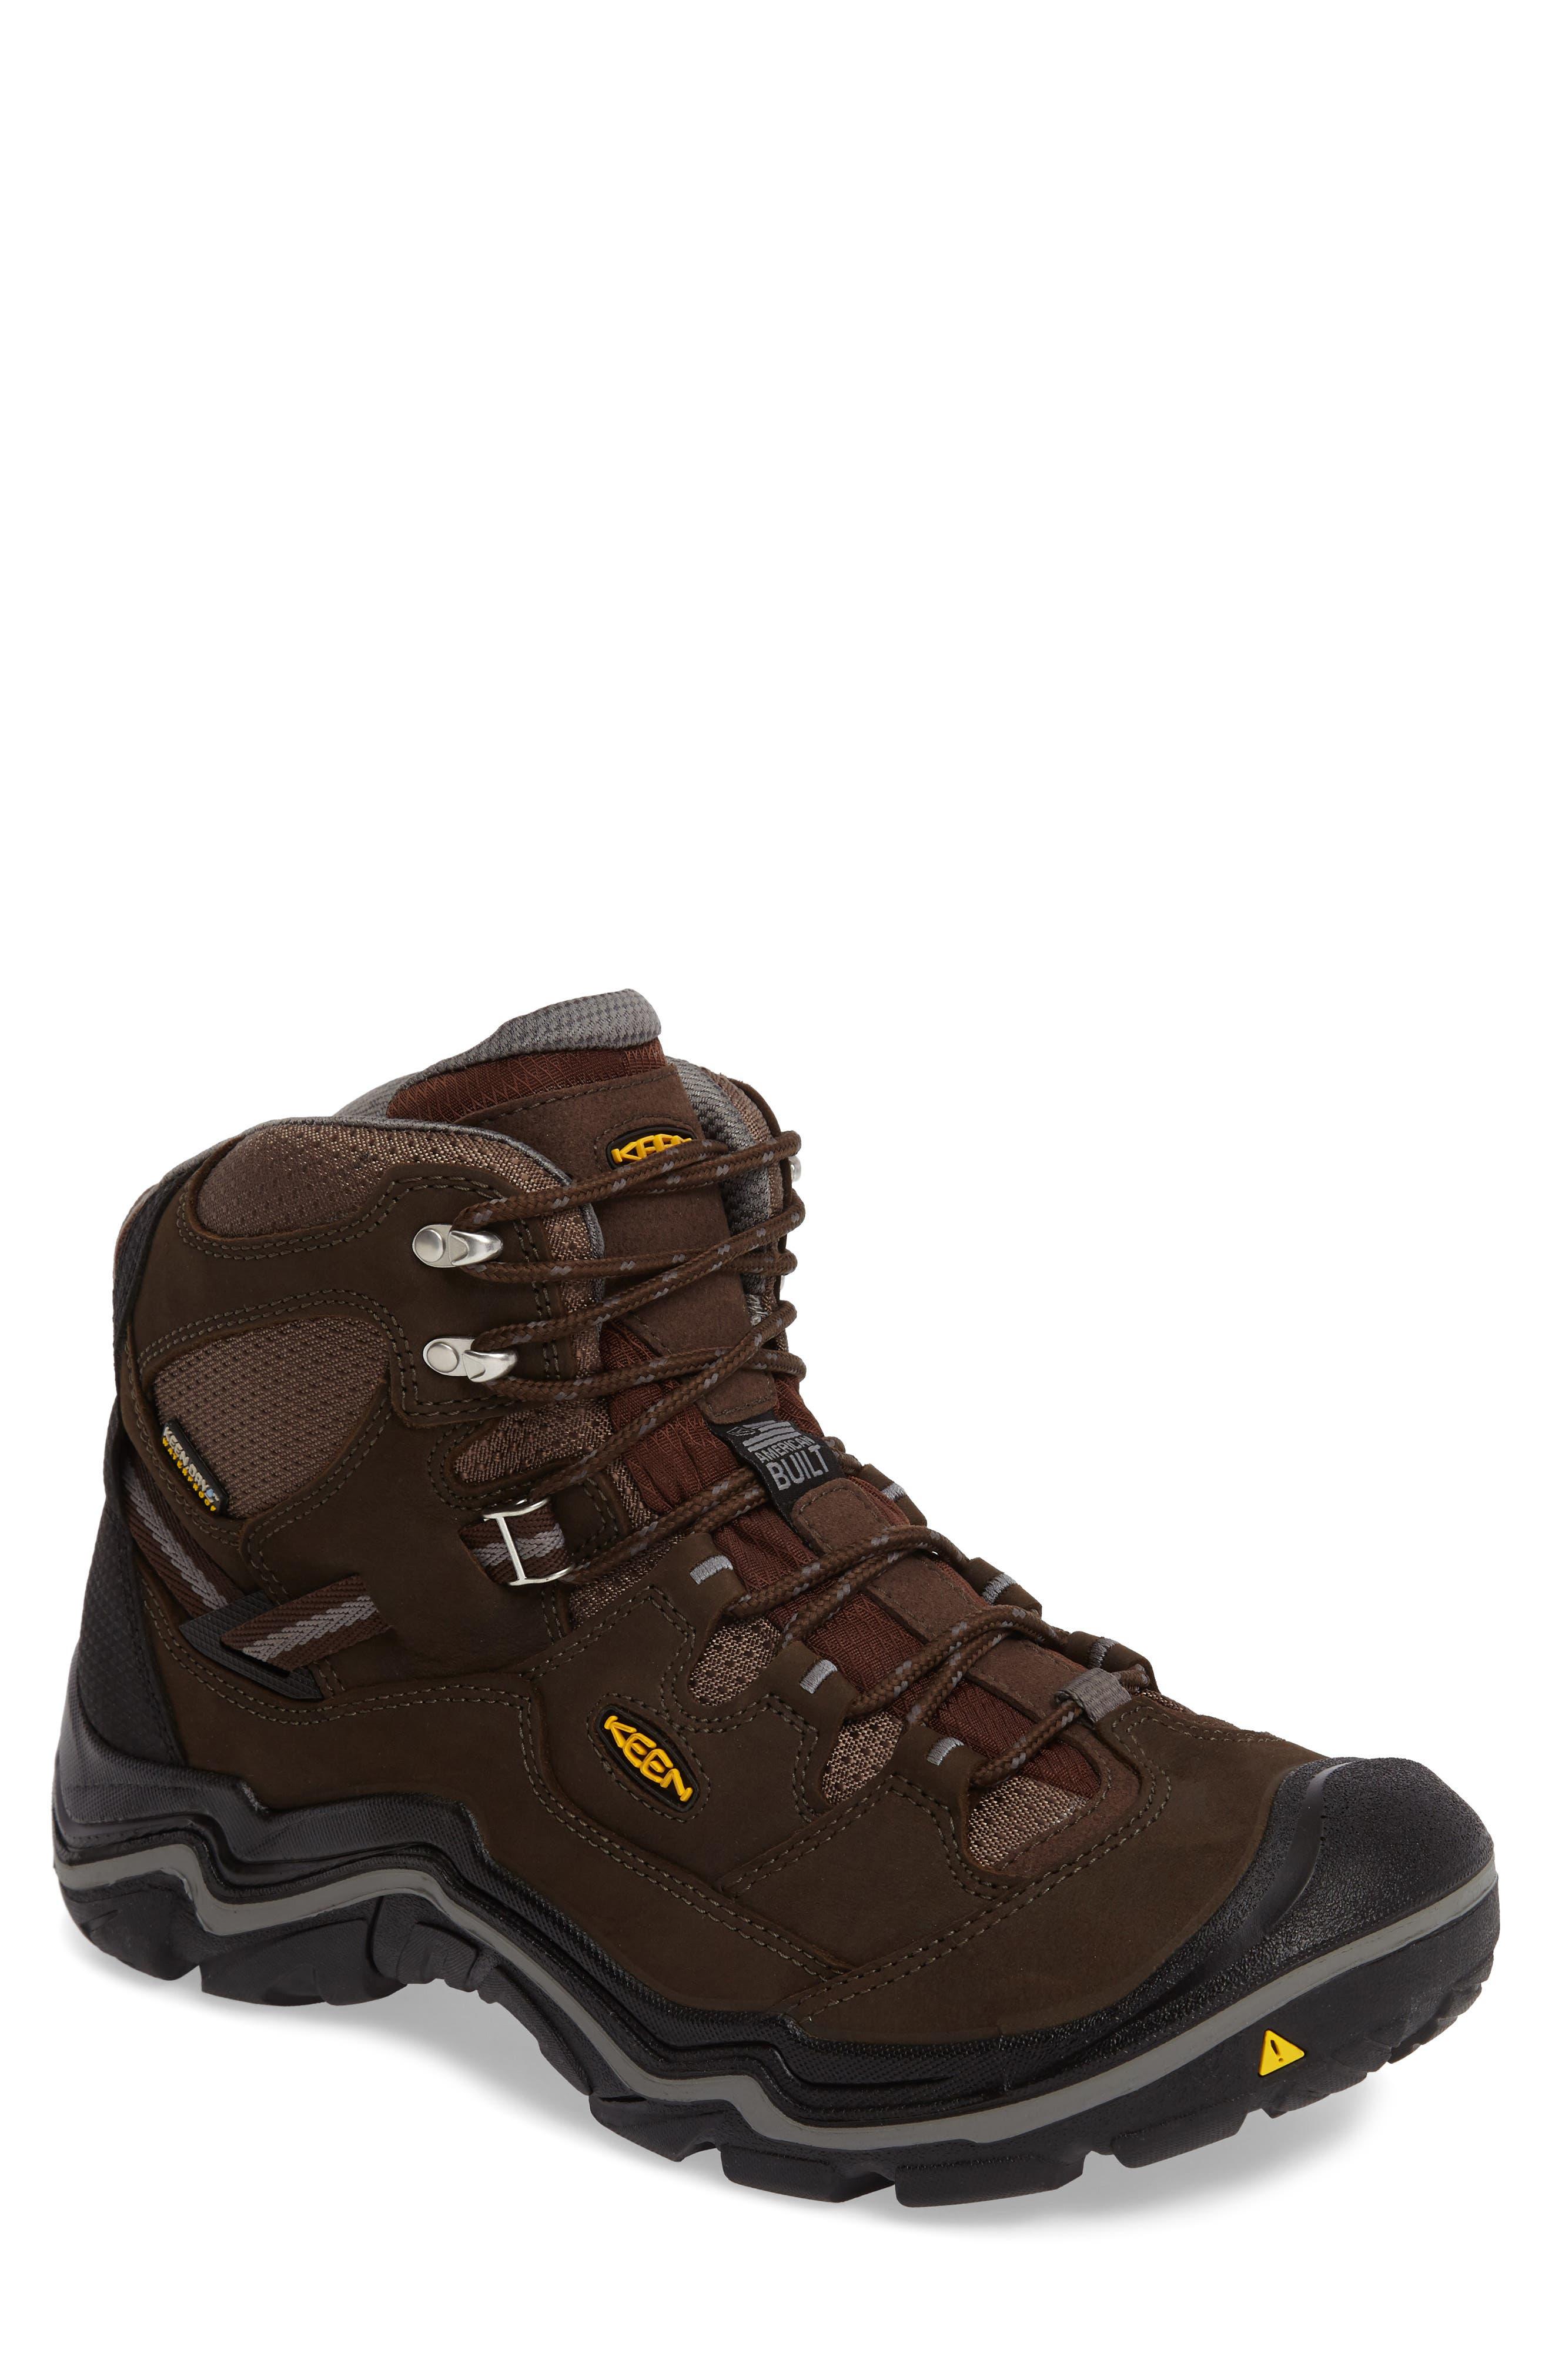 Main Image - Keen Durand Mid Waterproof Hiking Boot (Men)